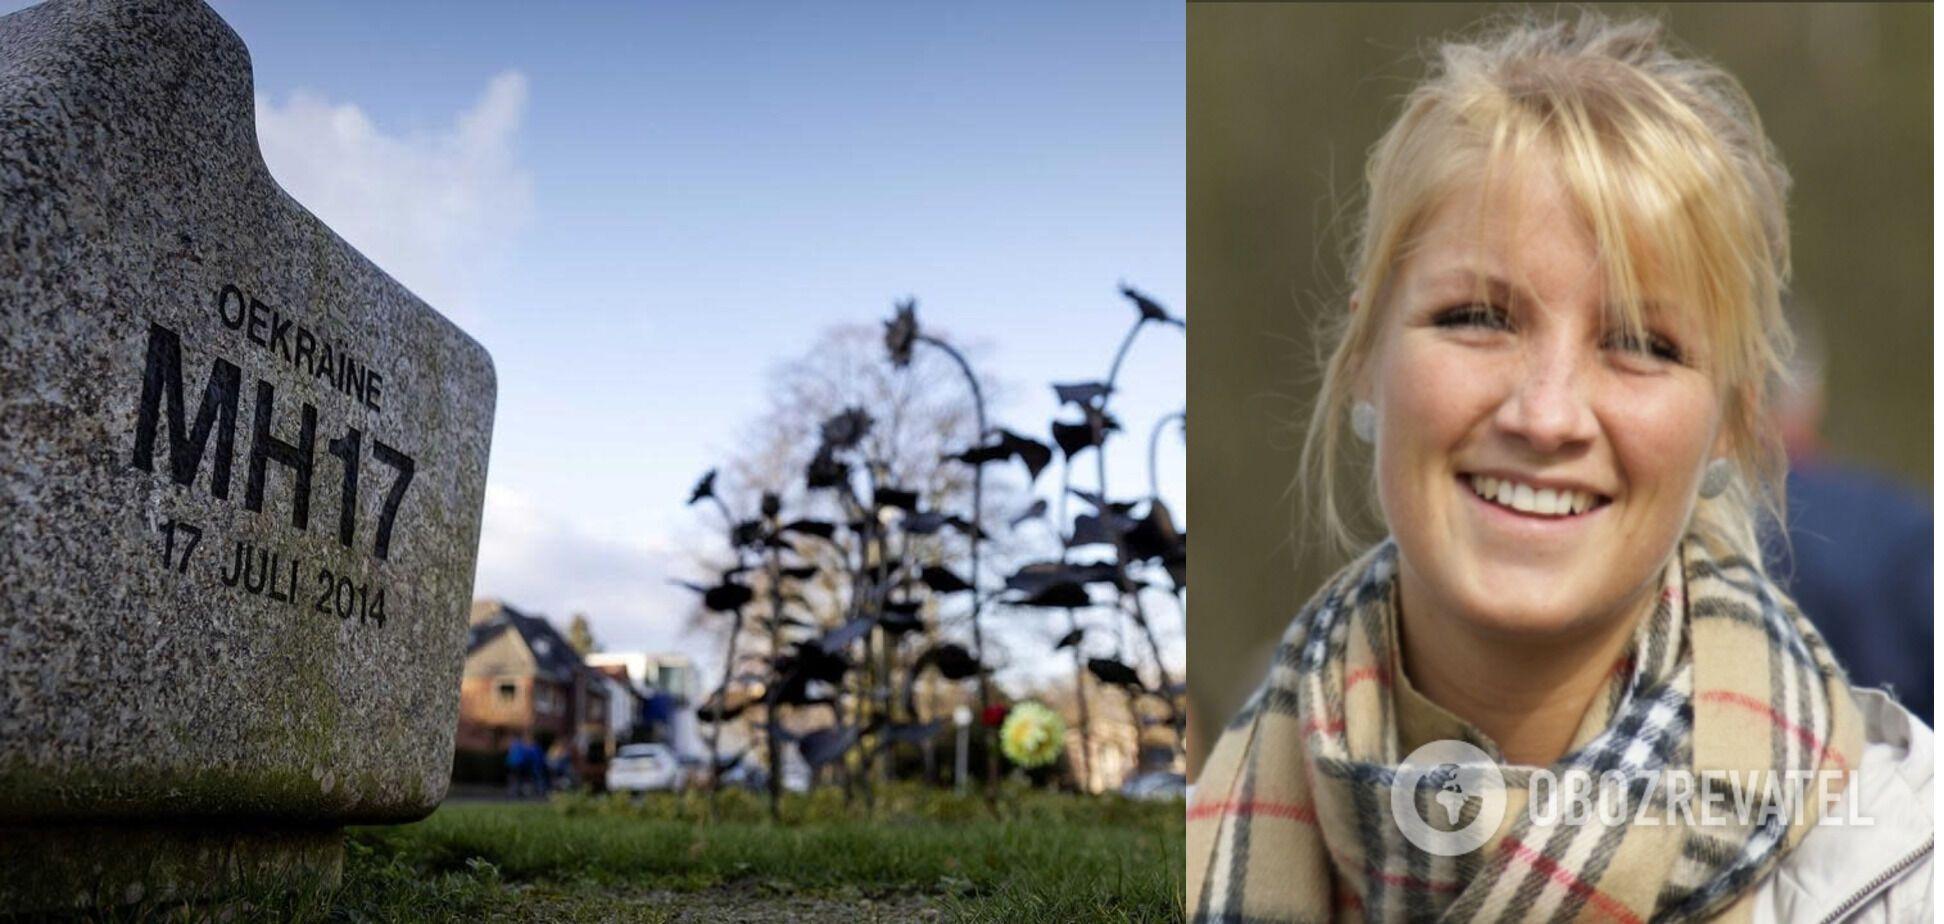 Донька нідерландця Йоса Джаноттена Ліка загинула в катастрофі МН17